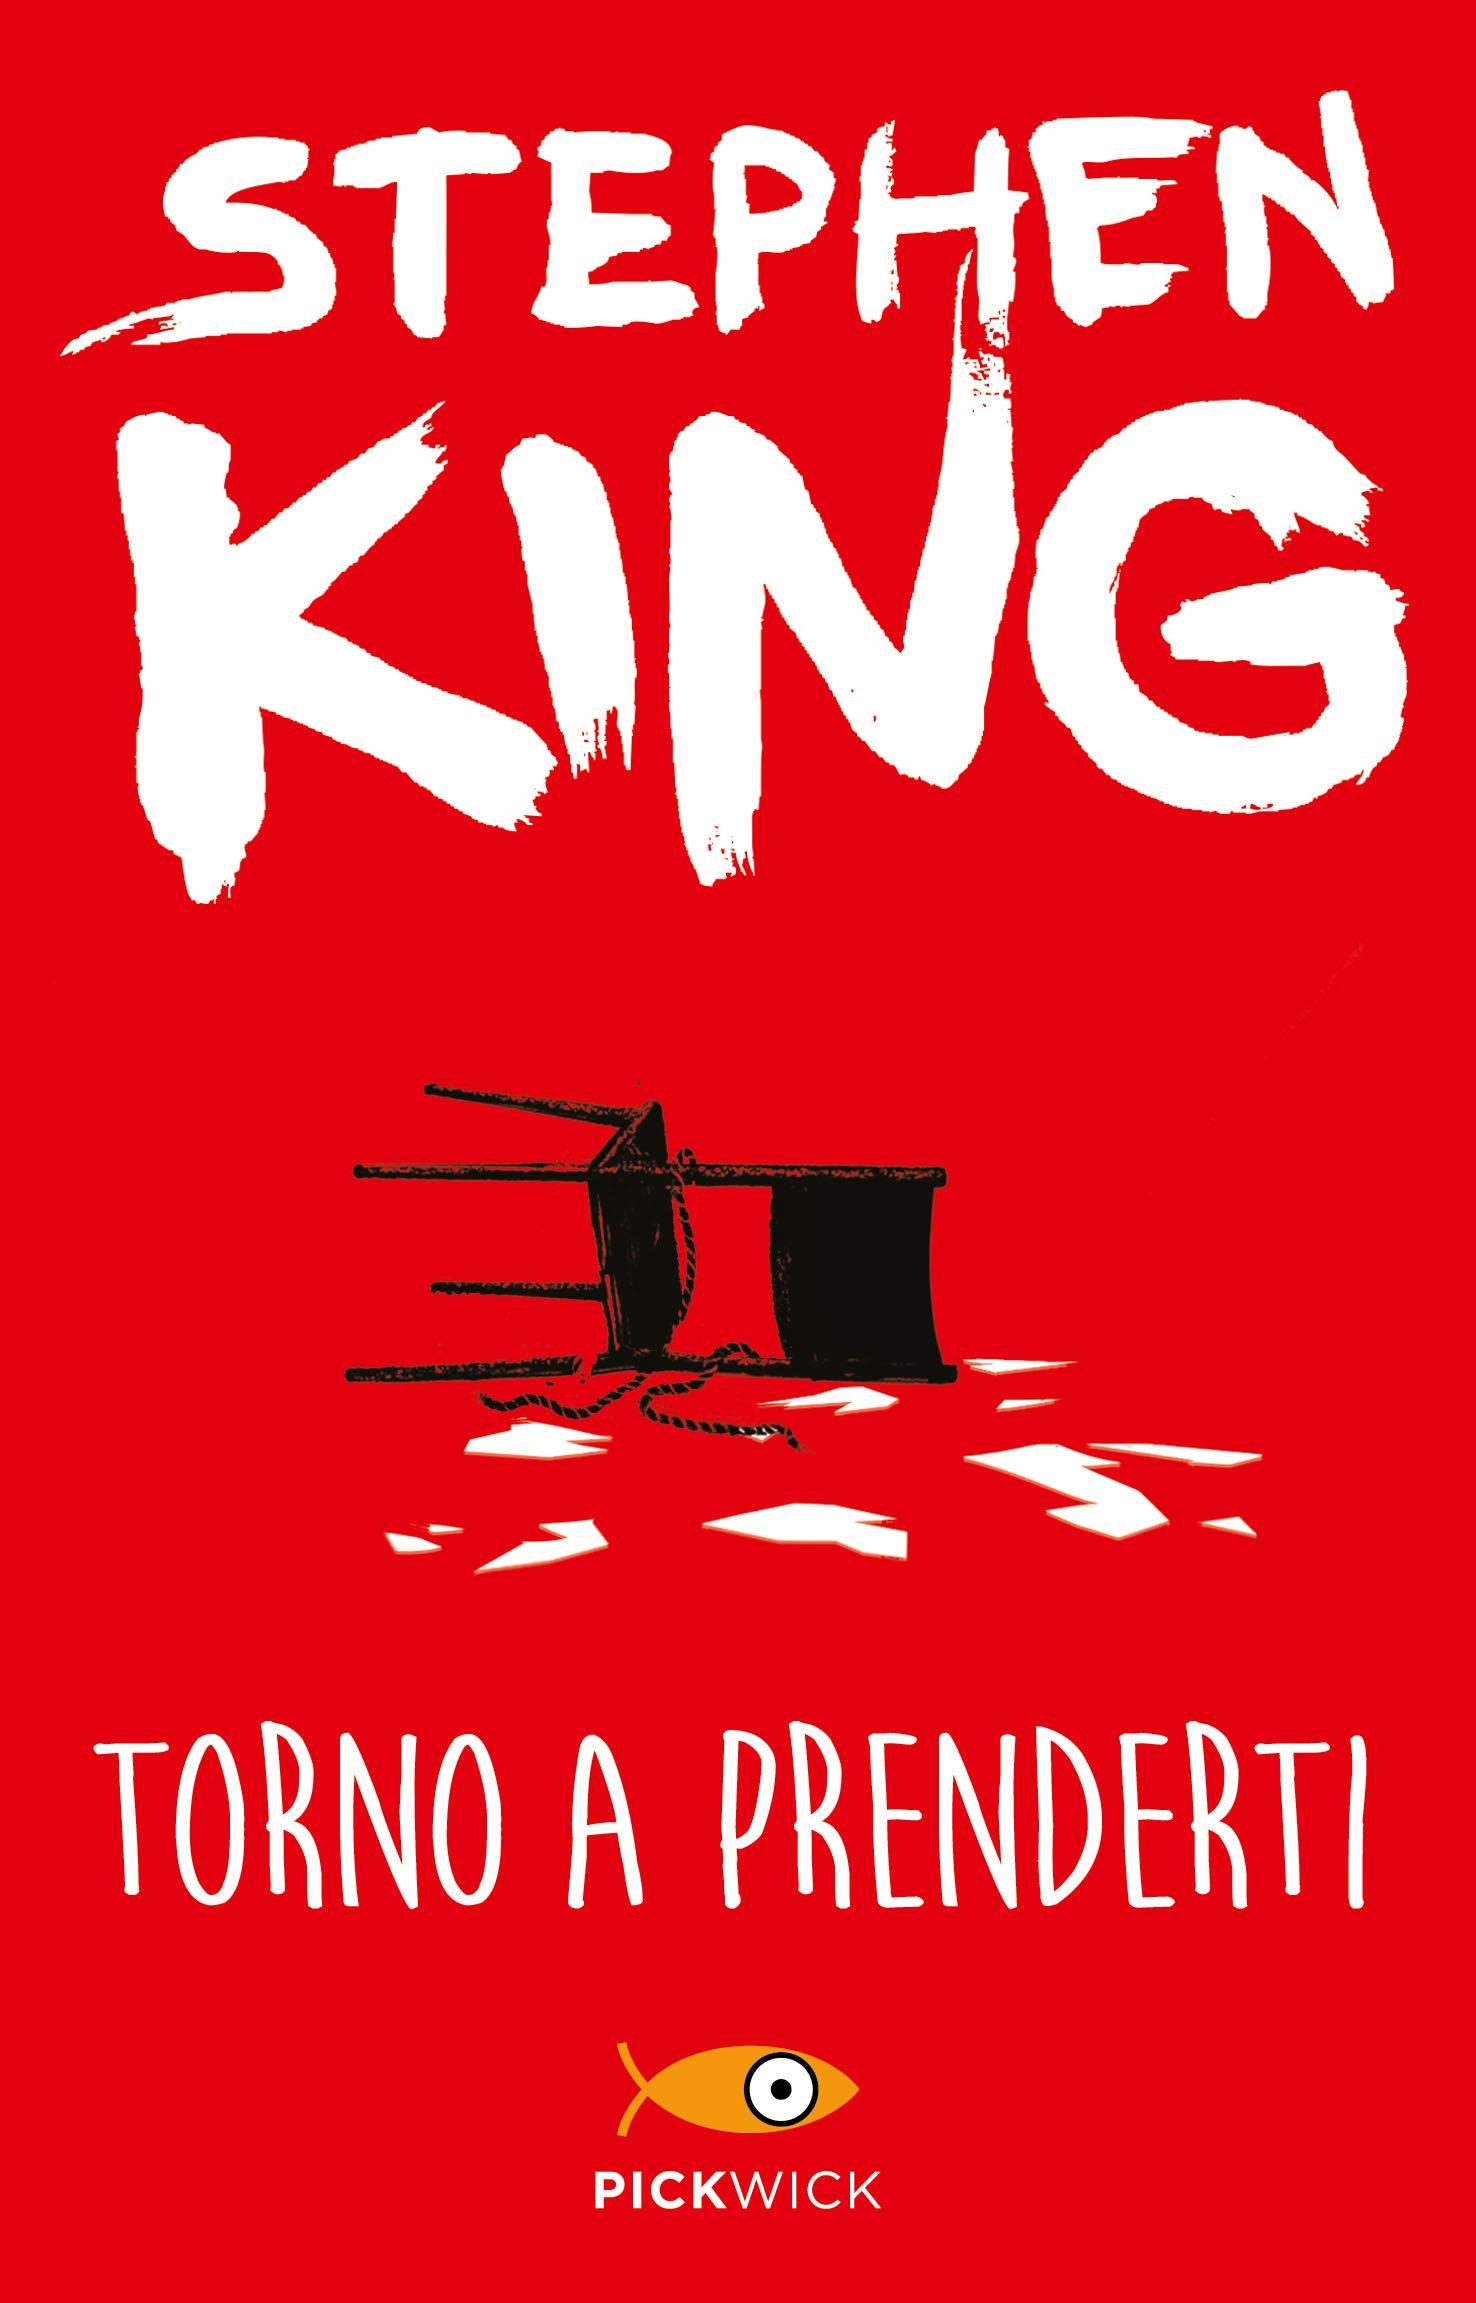 Stephen King – Torno a prenderti